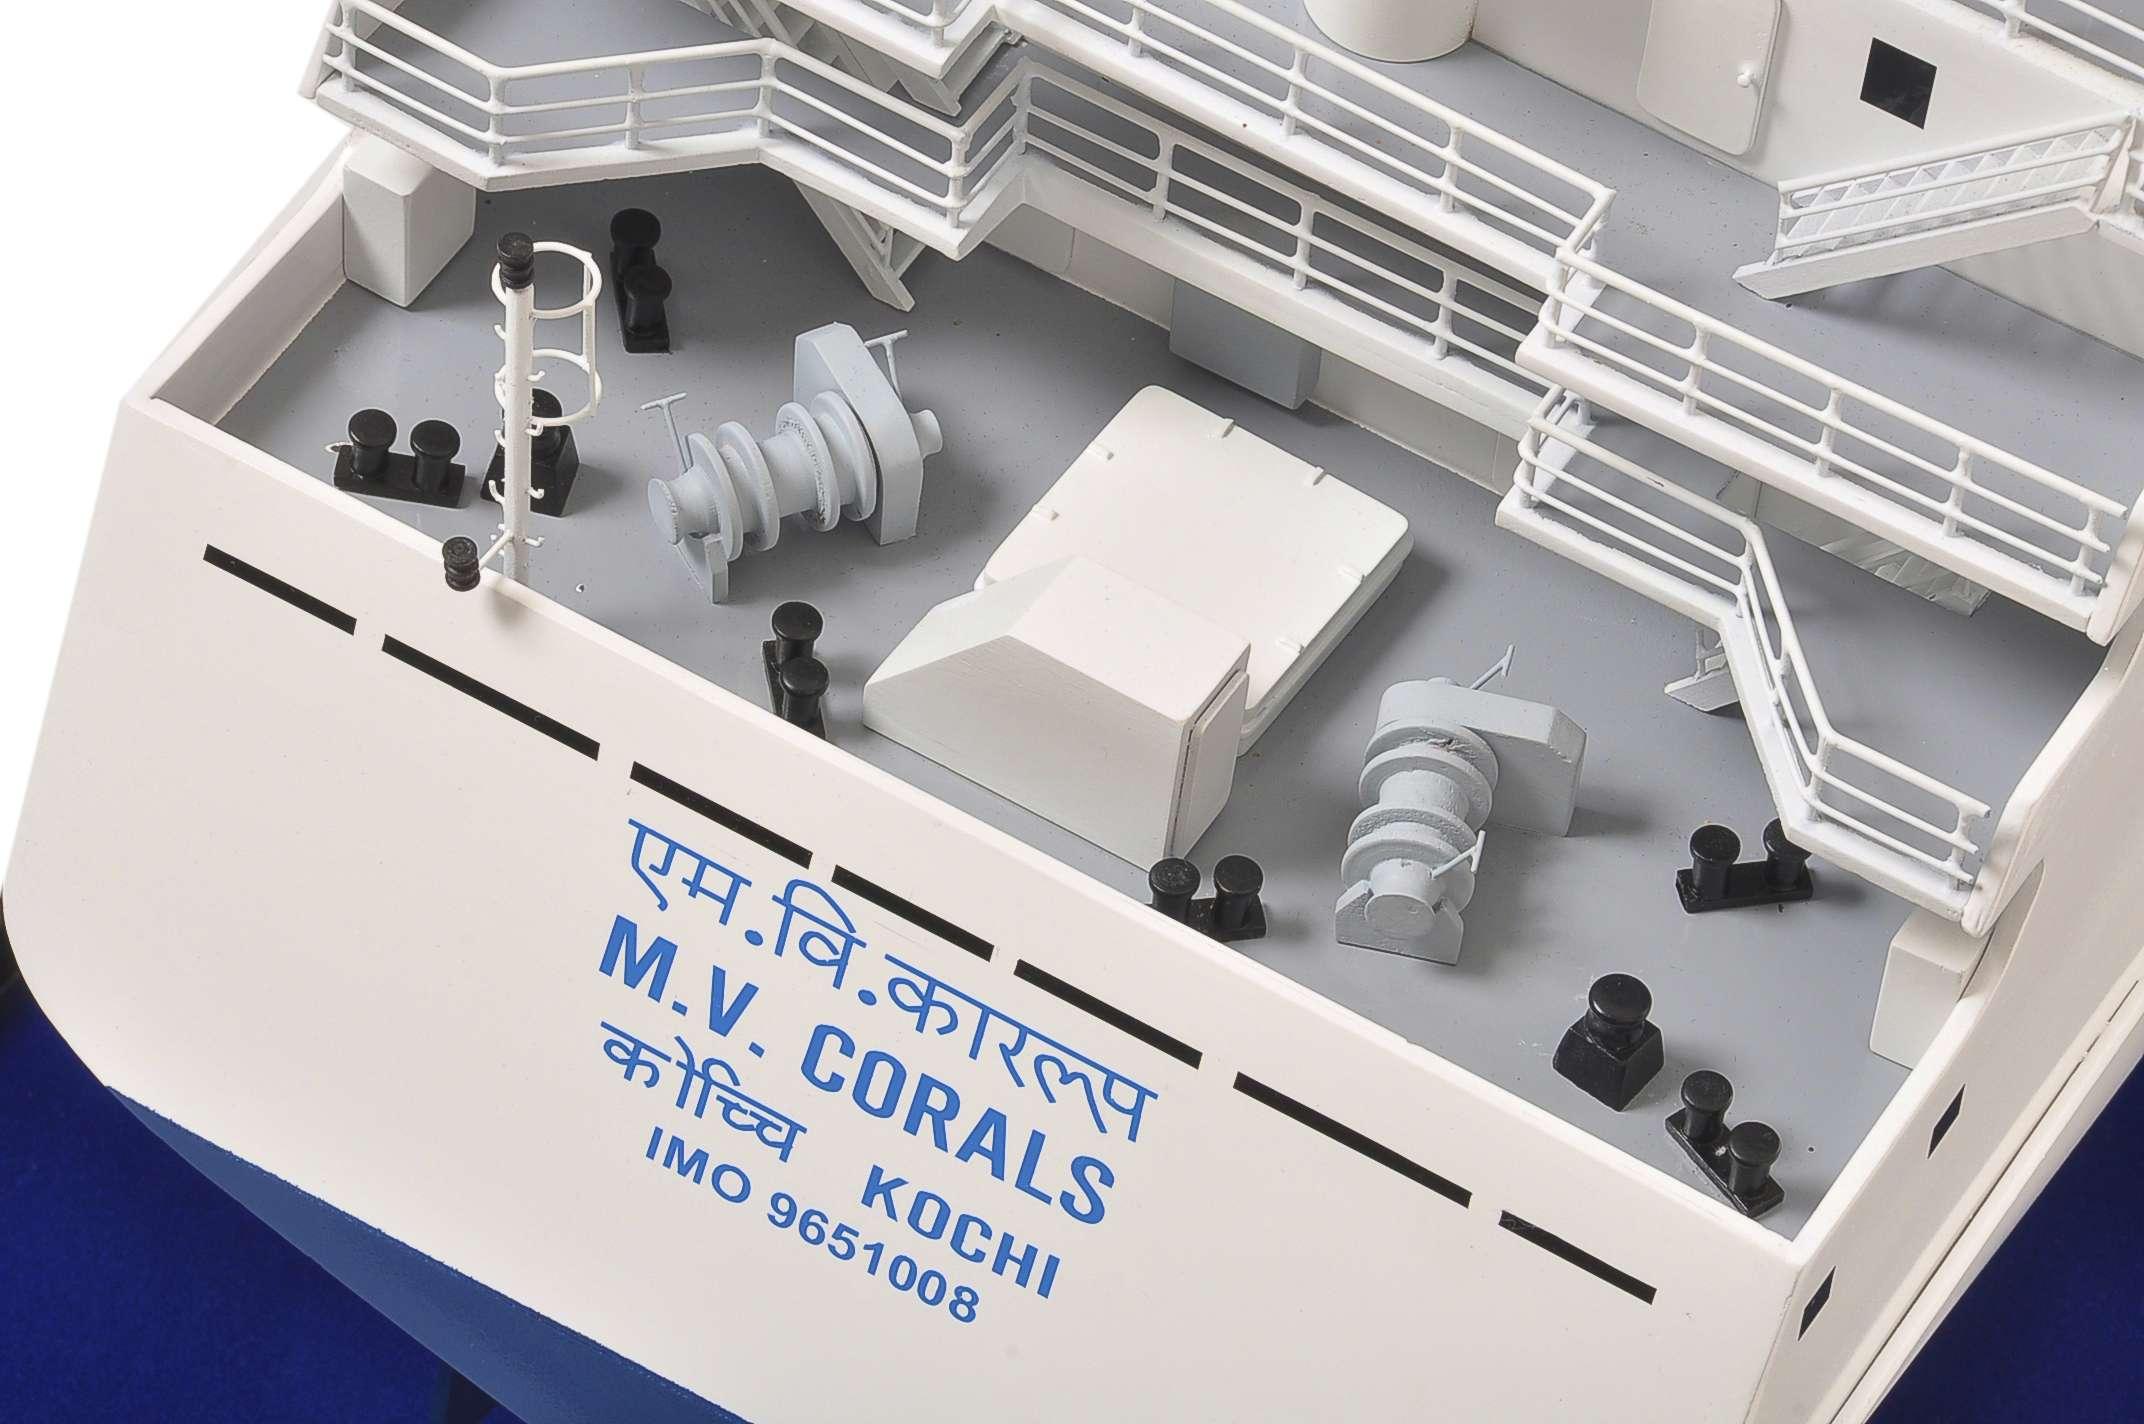 1477-4356-MV-Corals-Cargo-Vessel